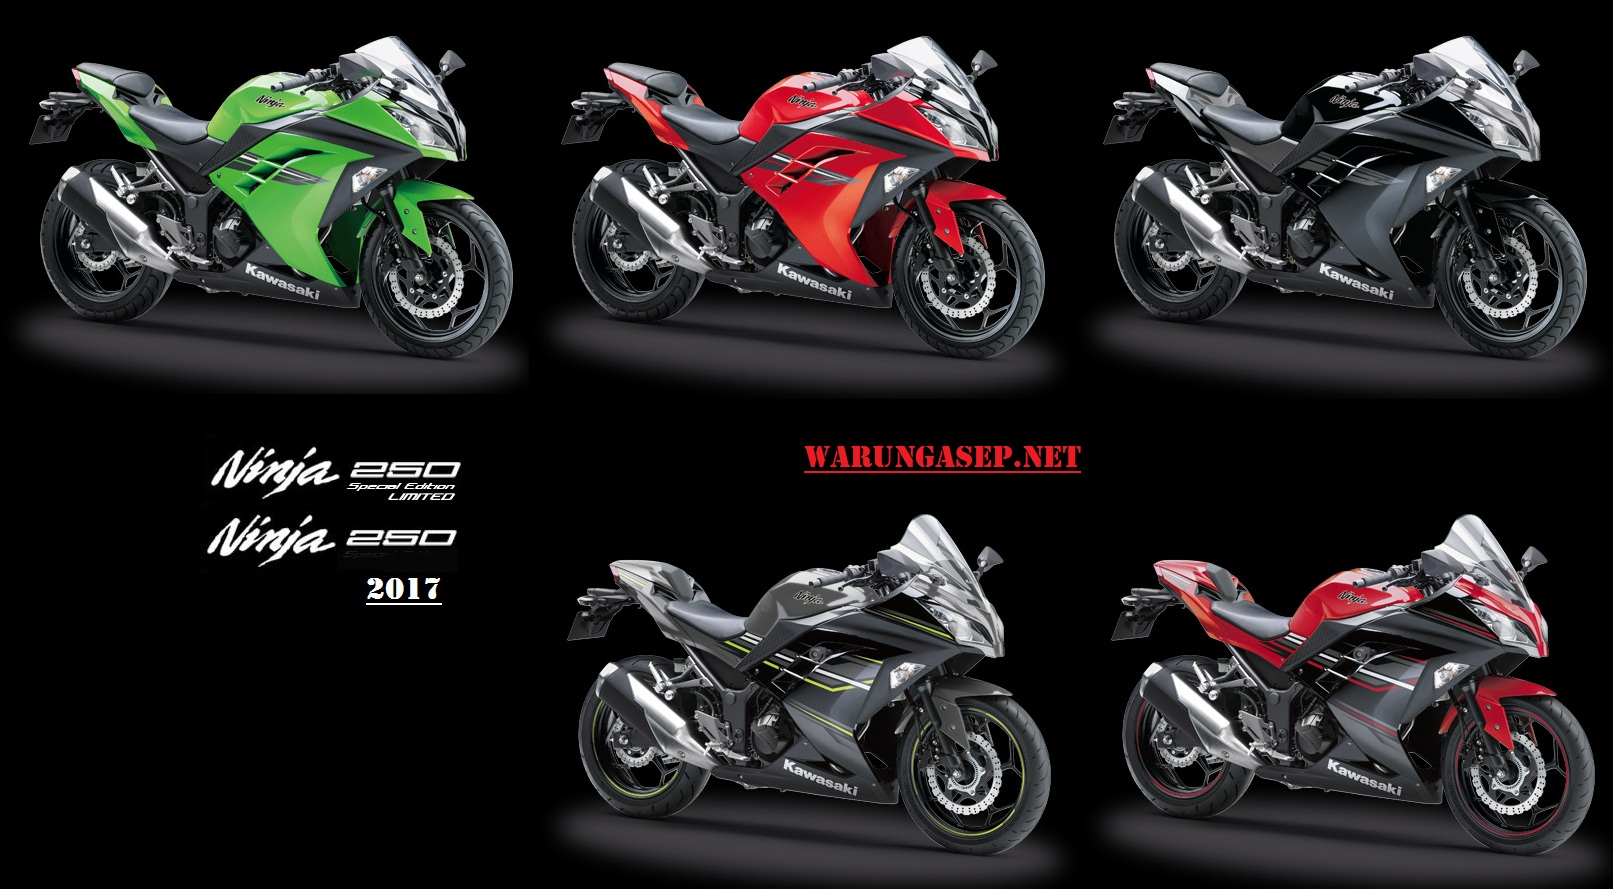 Harga Dan Warna Baru Kawasaki Ninja 250 Fi Se Abs 2017 Harga